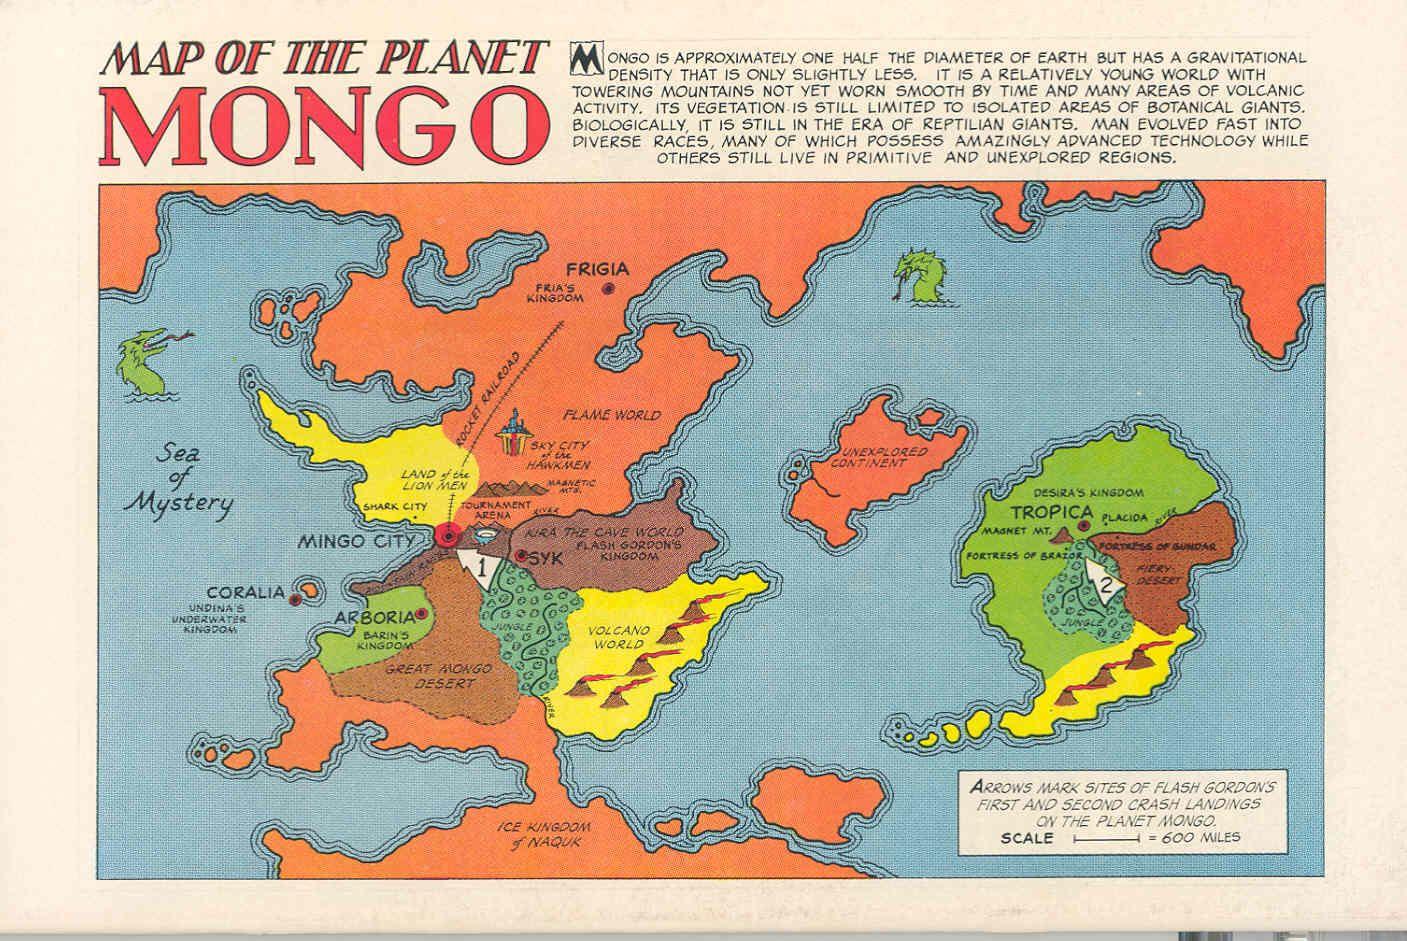 Blog4mongomapjpg 1407941 pixels Map of the Plant MONGO Flash